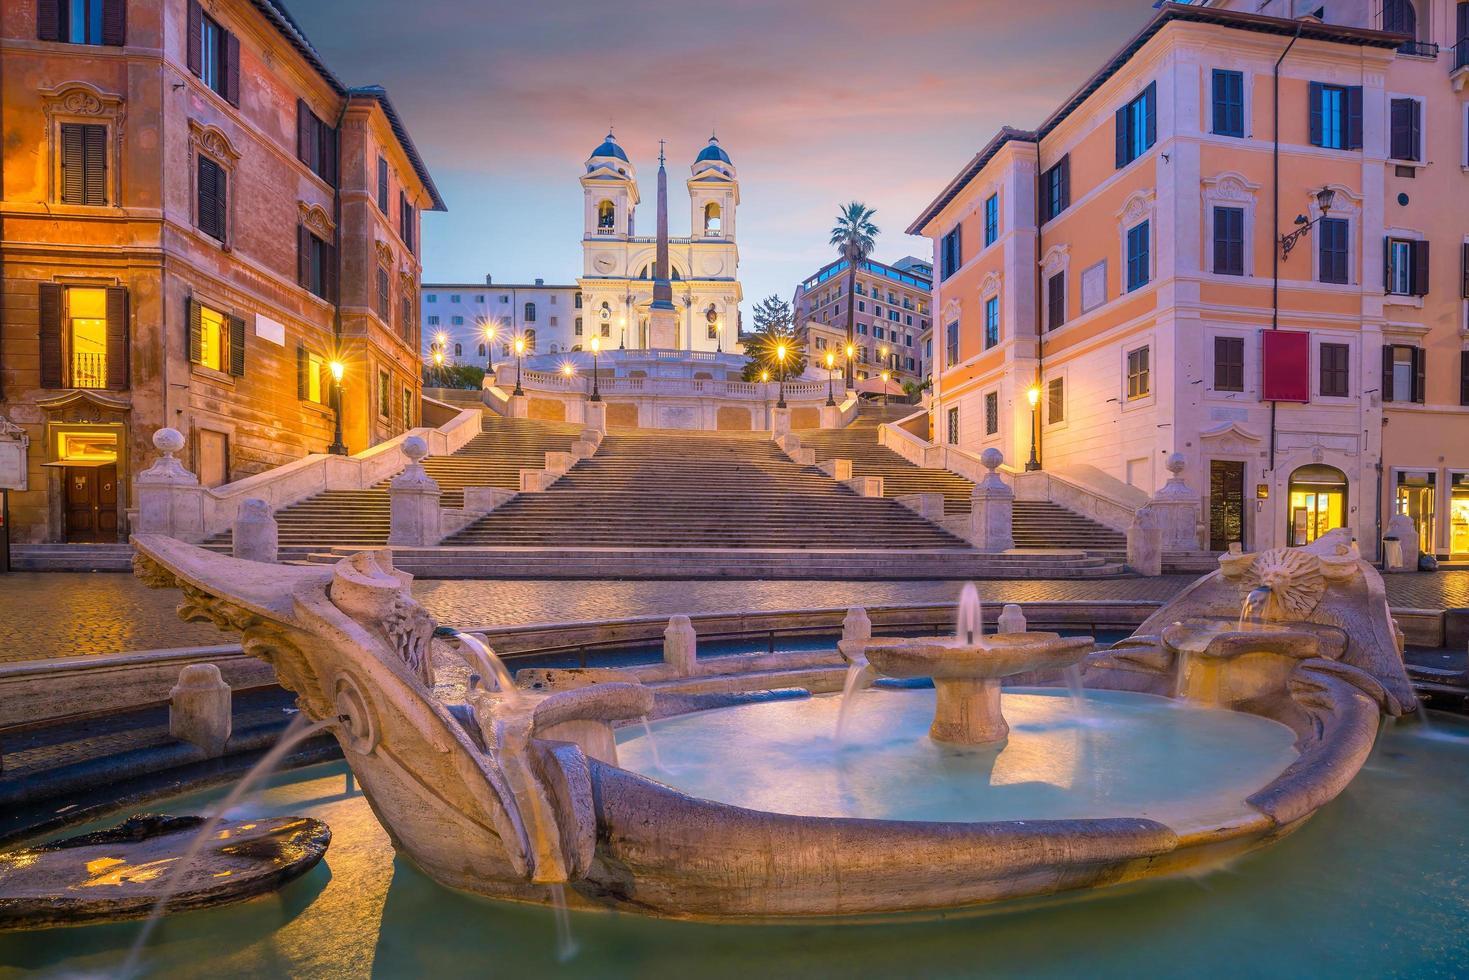 piazza de spagna i Rom, Italien foto